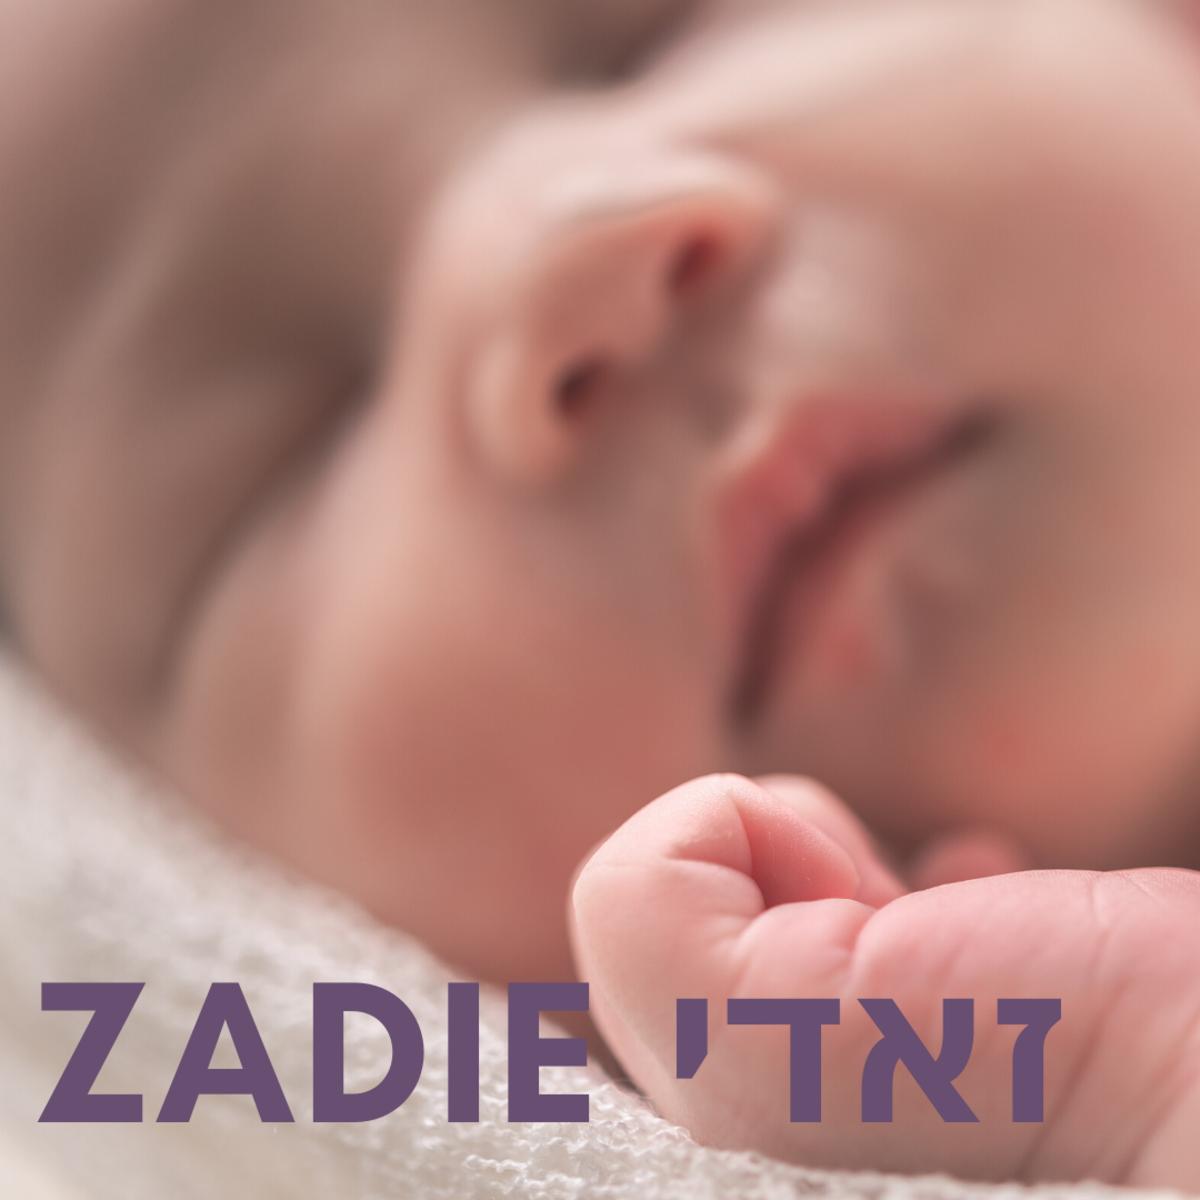 Baby Zadie